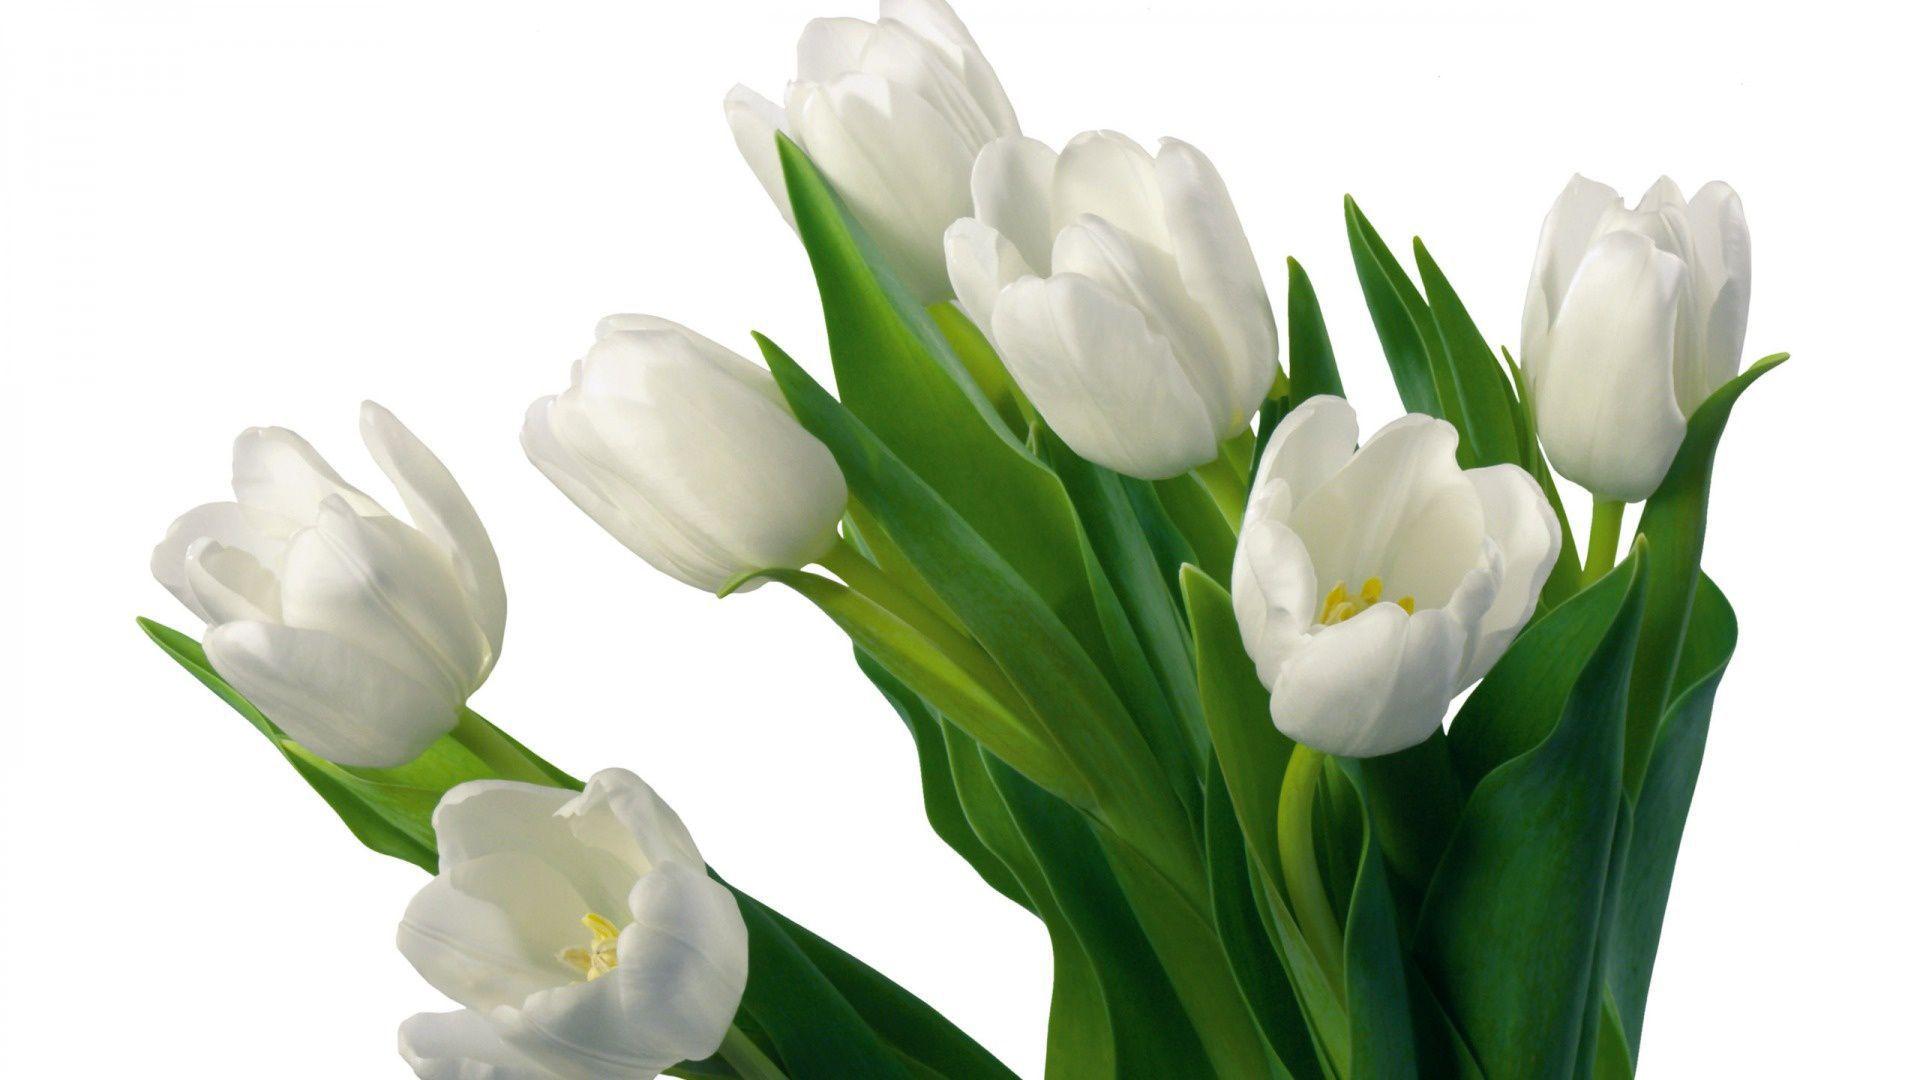 Tulips Photos